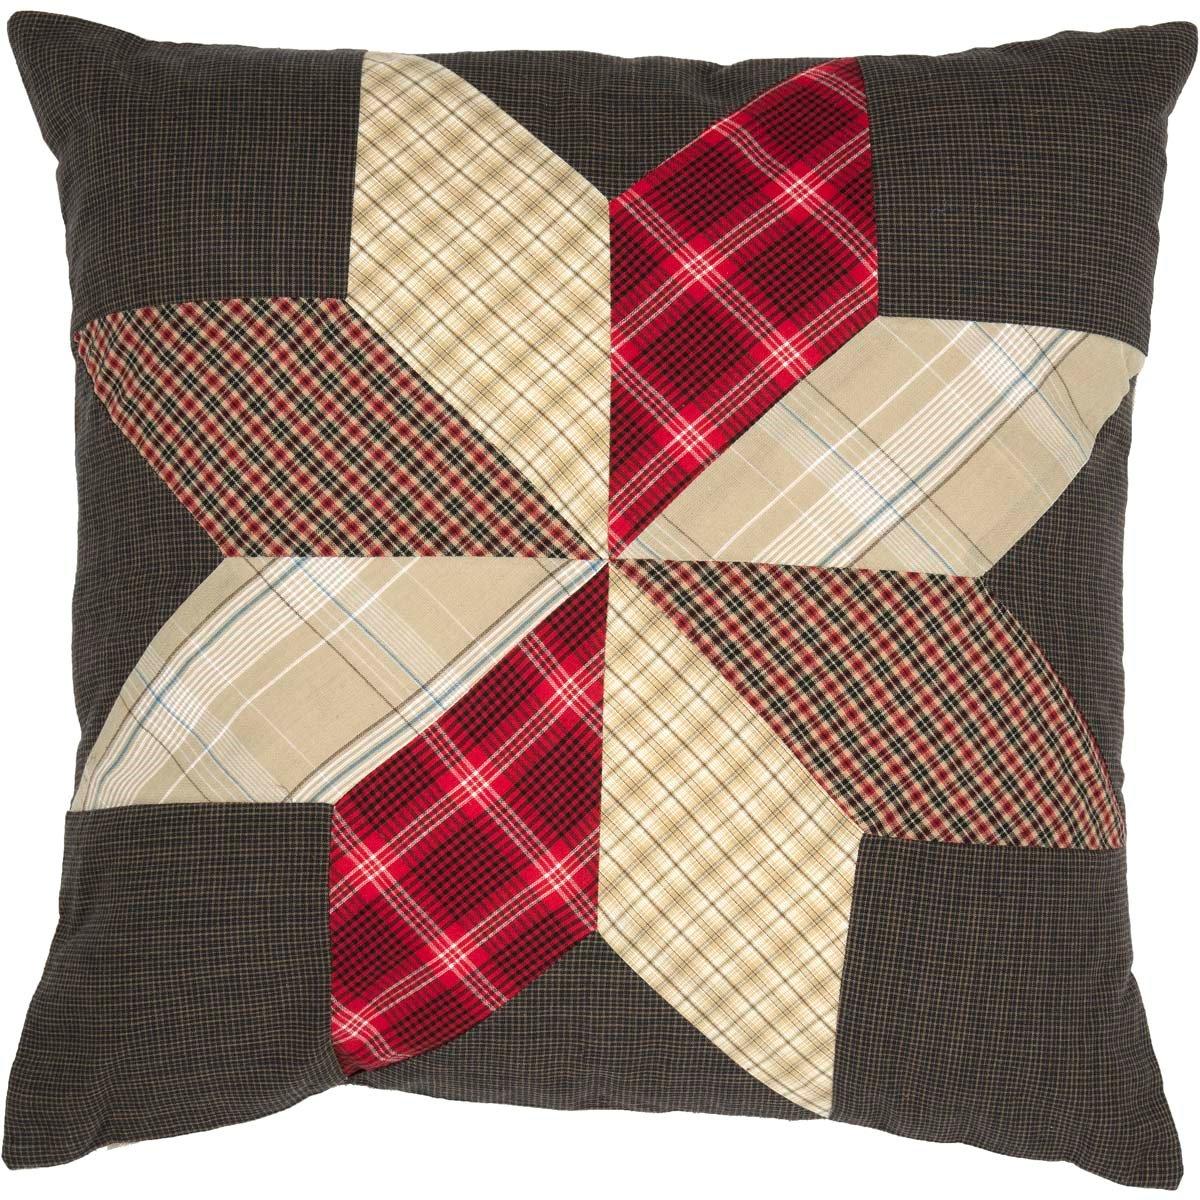 Liberty Stars Patchwork Pillow 18 x 18